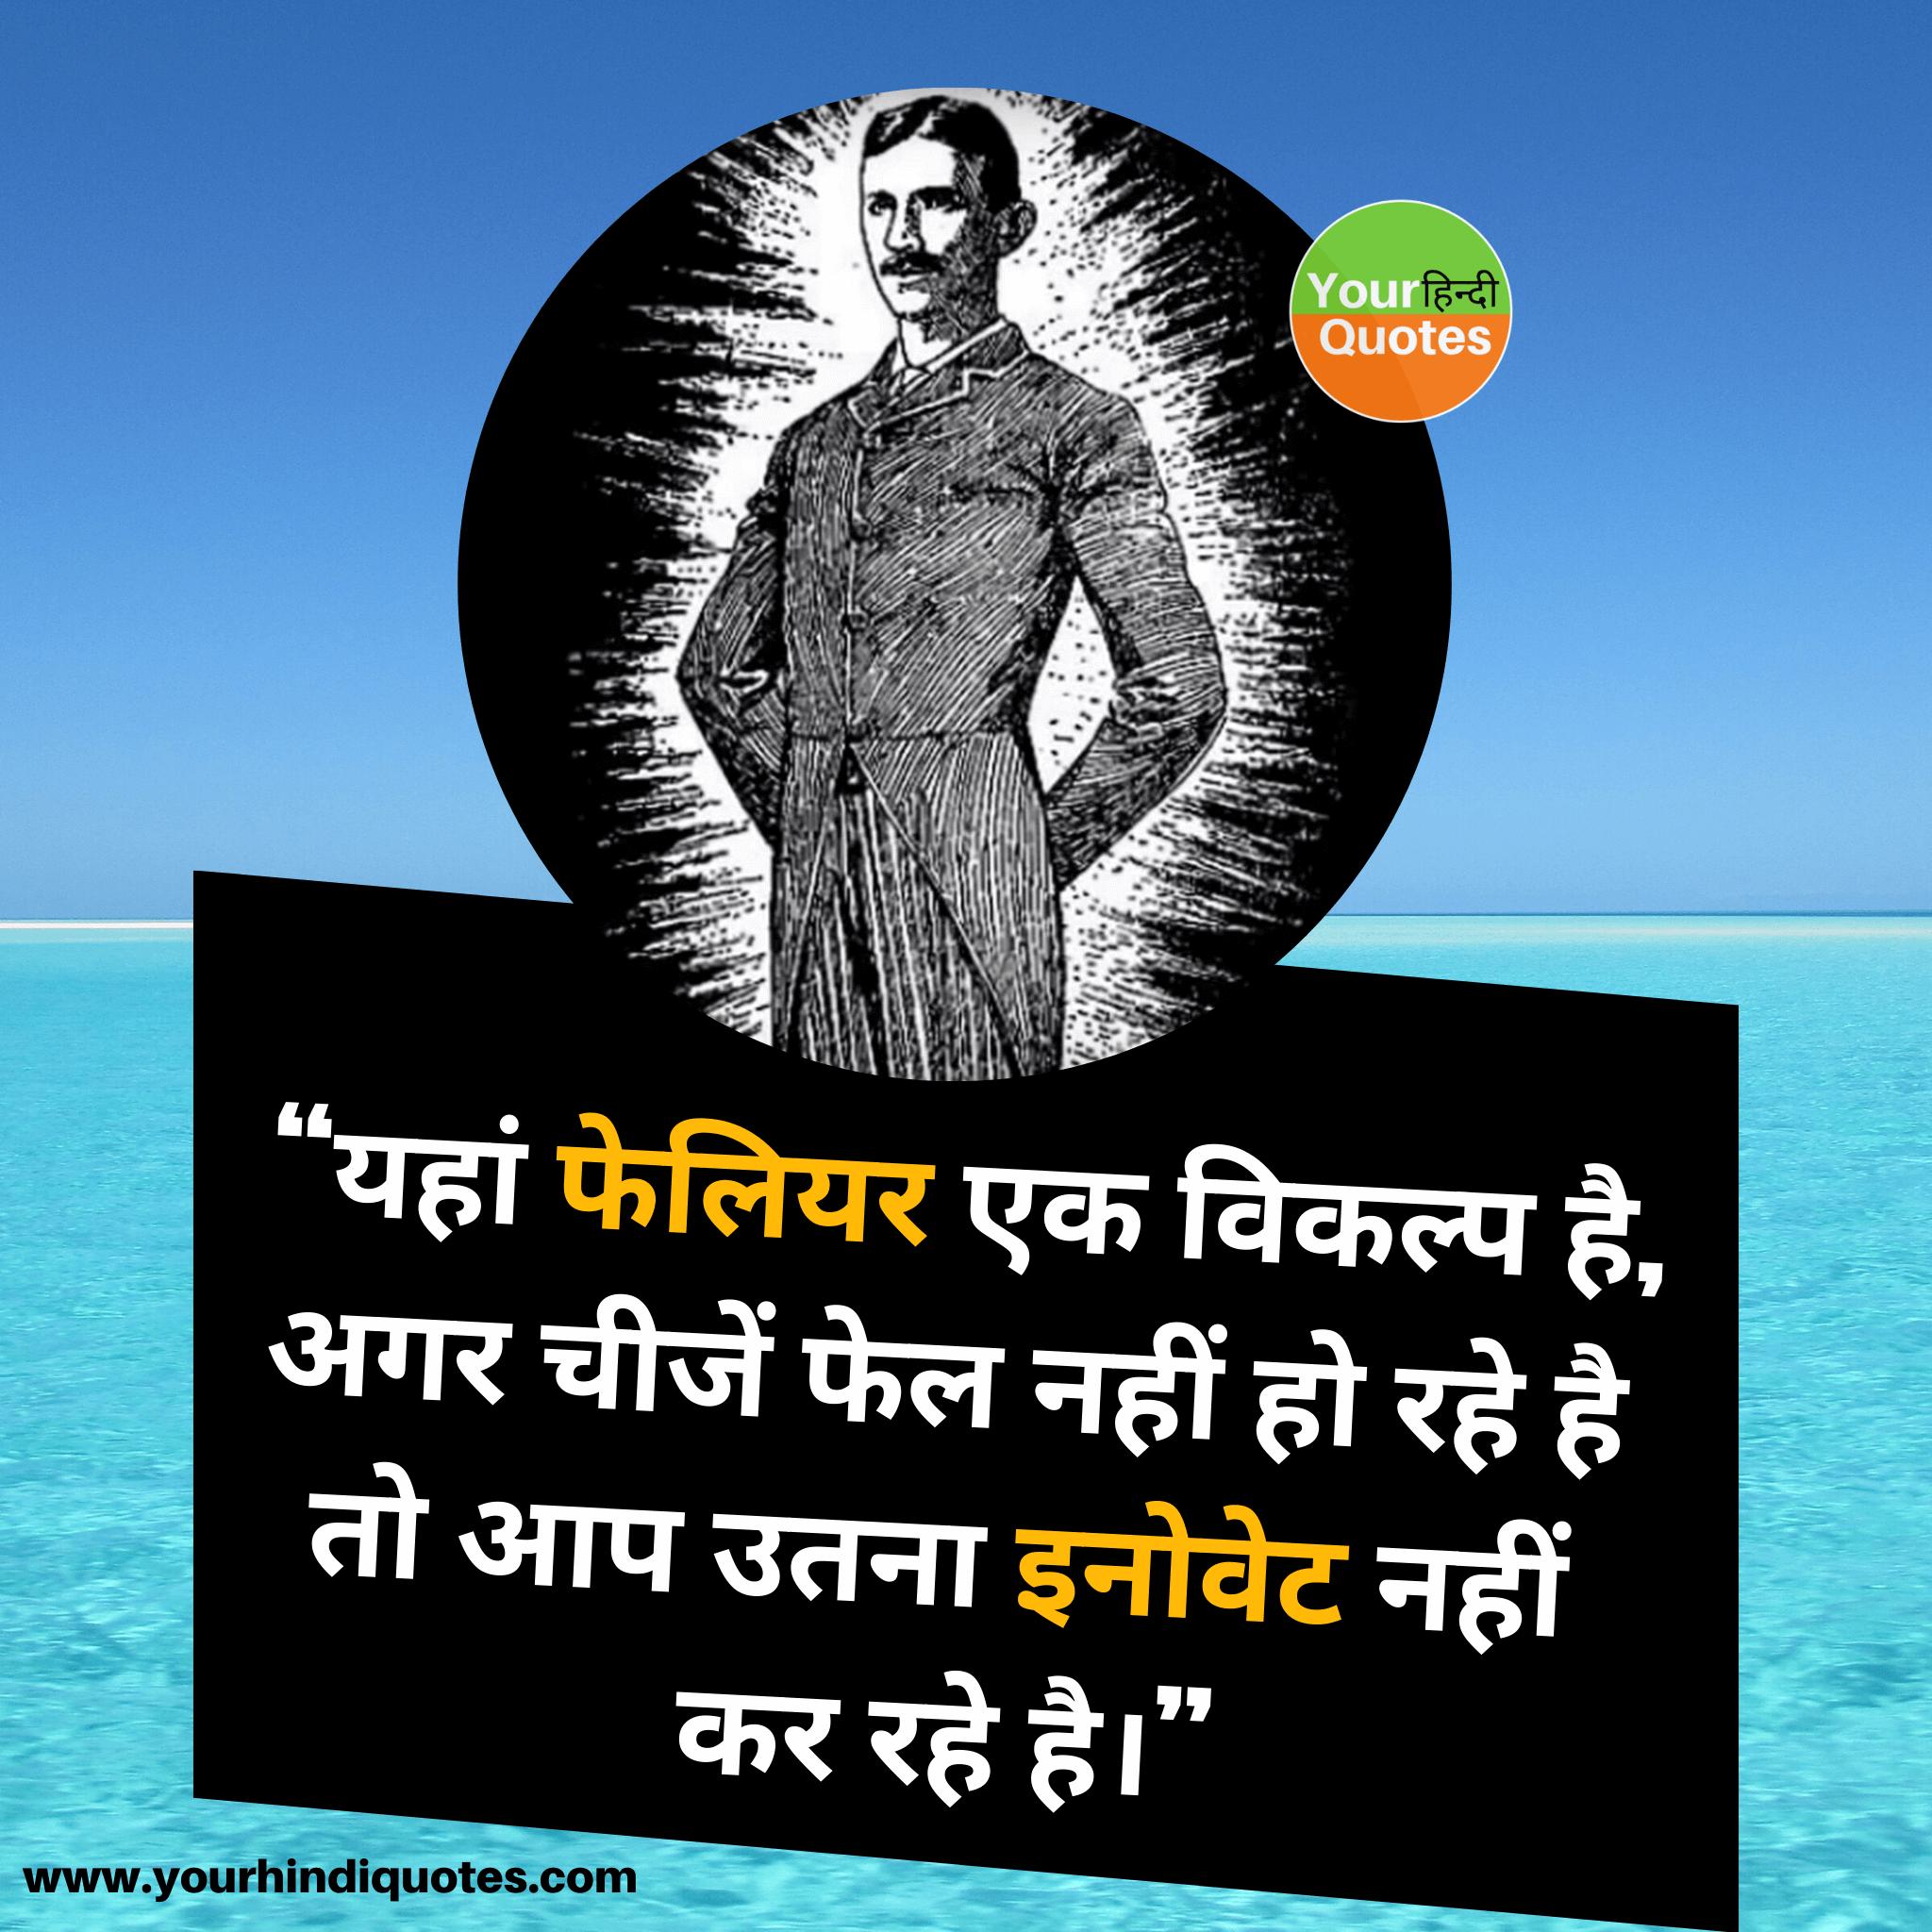 Nikola Tesla Quotes Hindi Images (1)